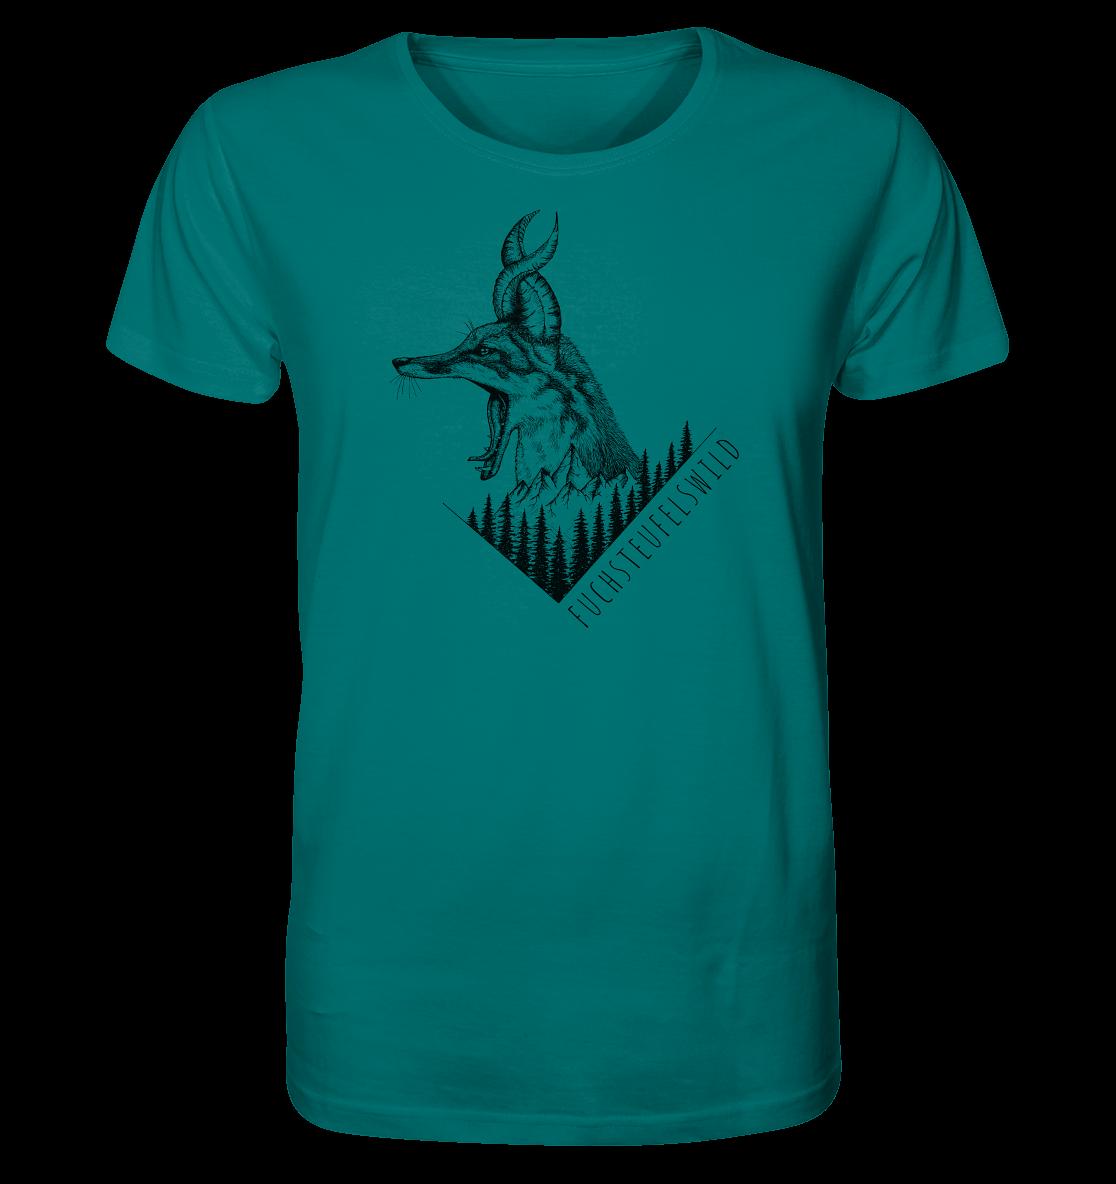 front-organic-shirt-007373-1116x-7.png